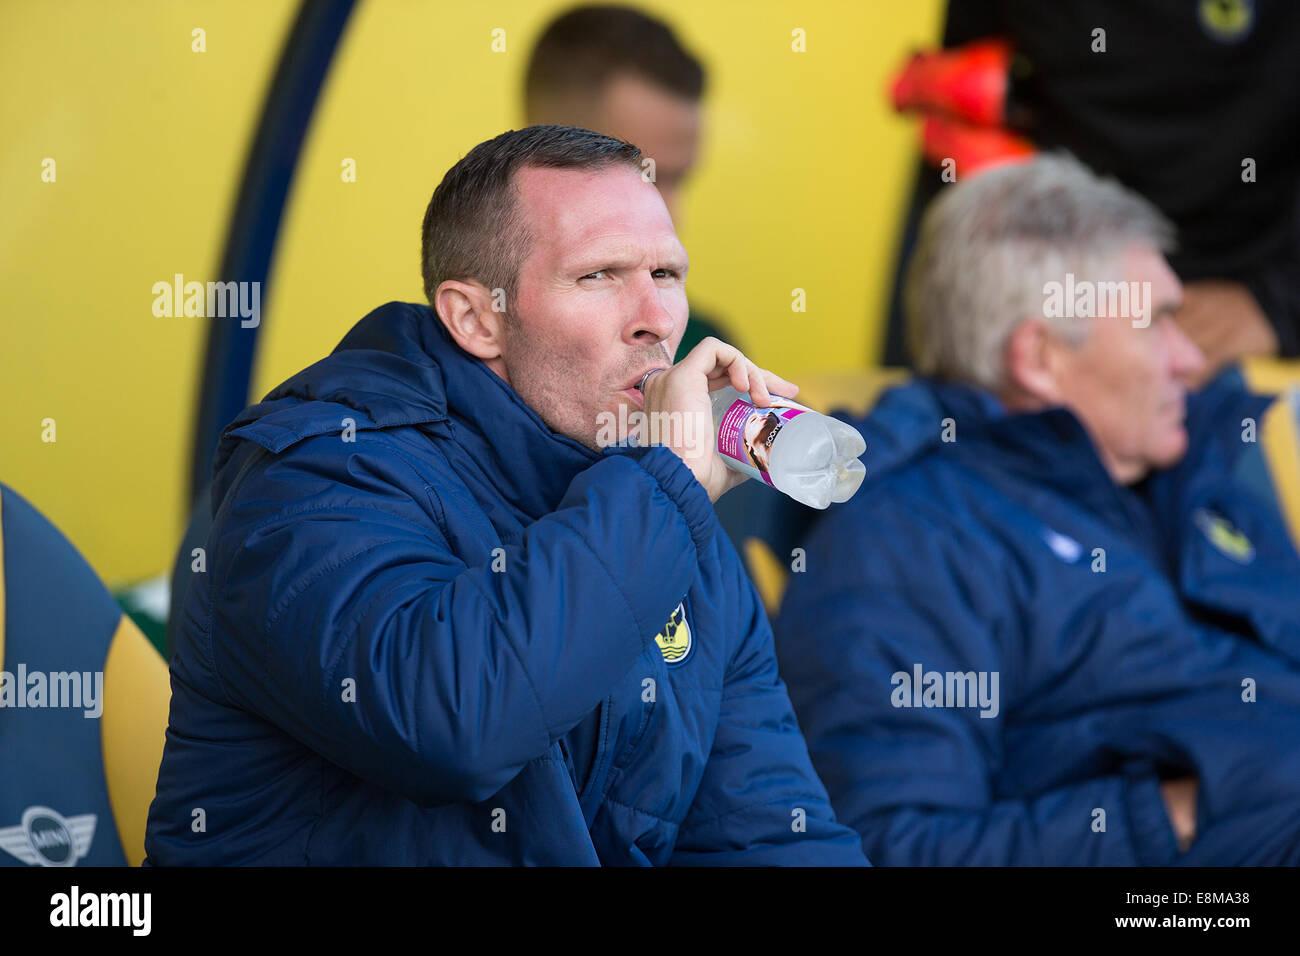 04/10/2014 FOOTBALL: Oxford United v Newport Utd head coach, Michael Appleton. Catchline: FOOTBALL: United v Newport - Stock Image